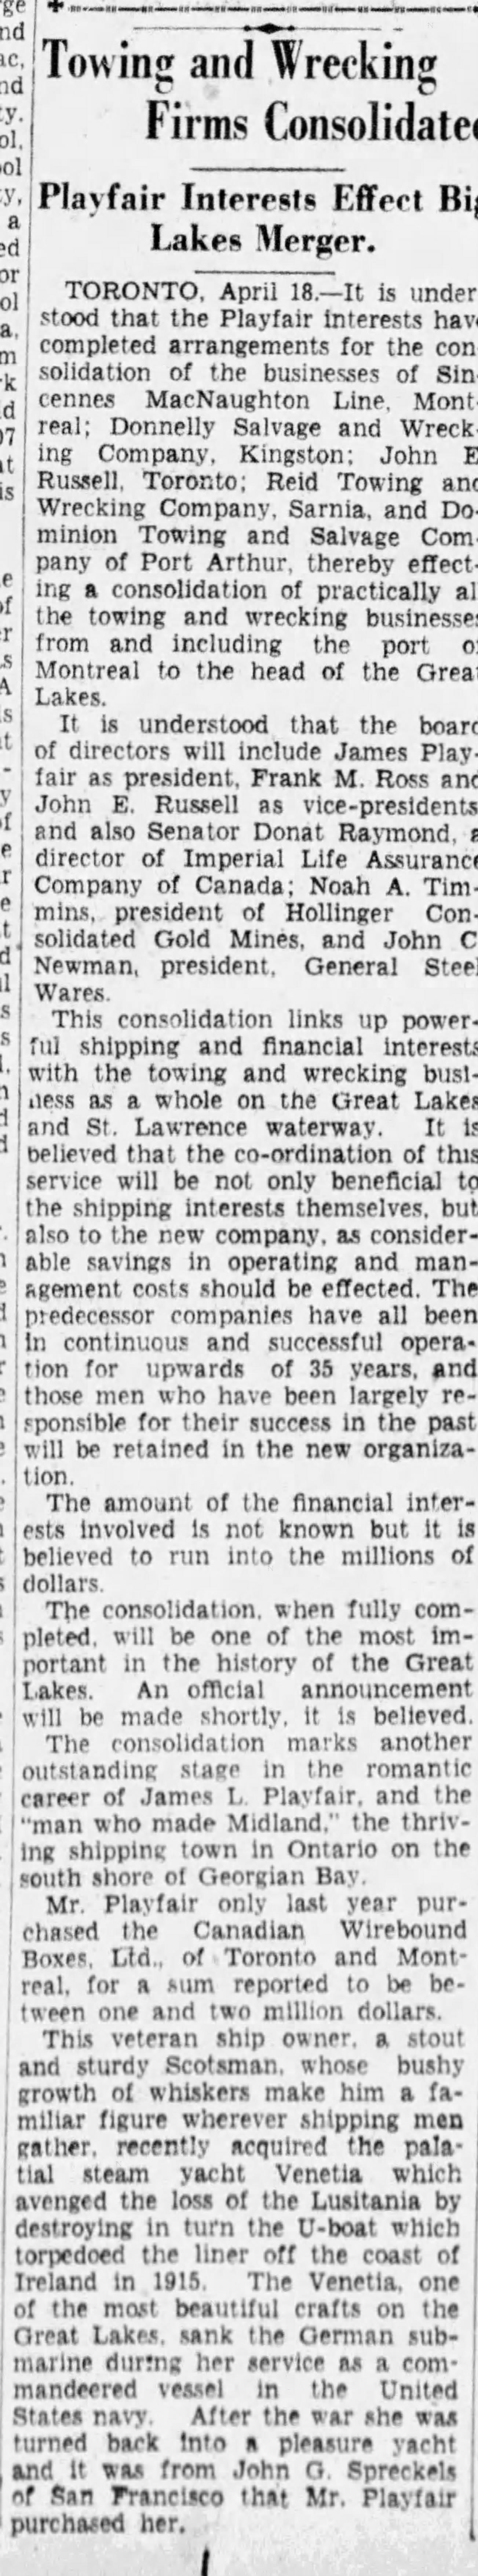 19290418 Ottawa Citizen Consolidation dredging companies